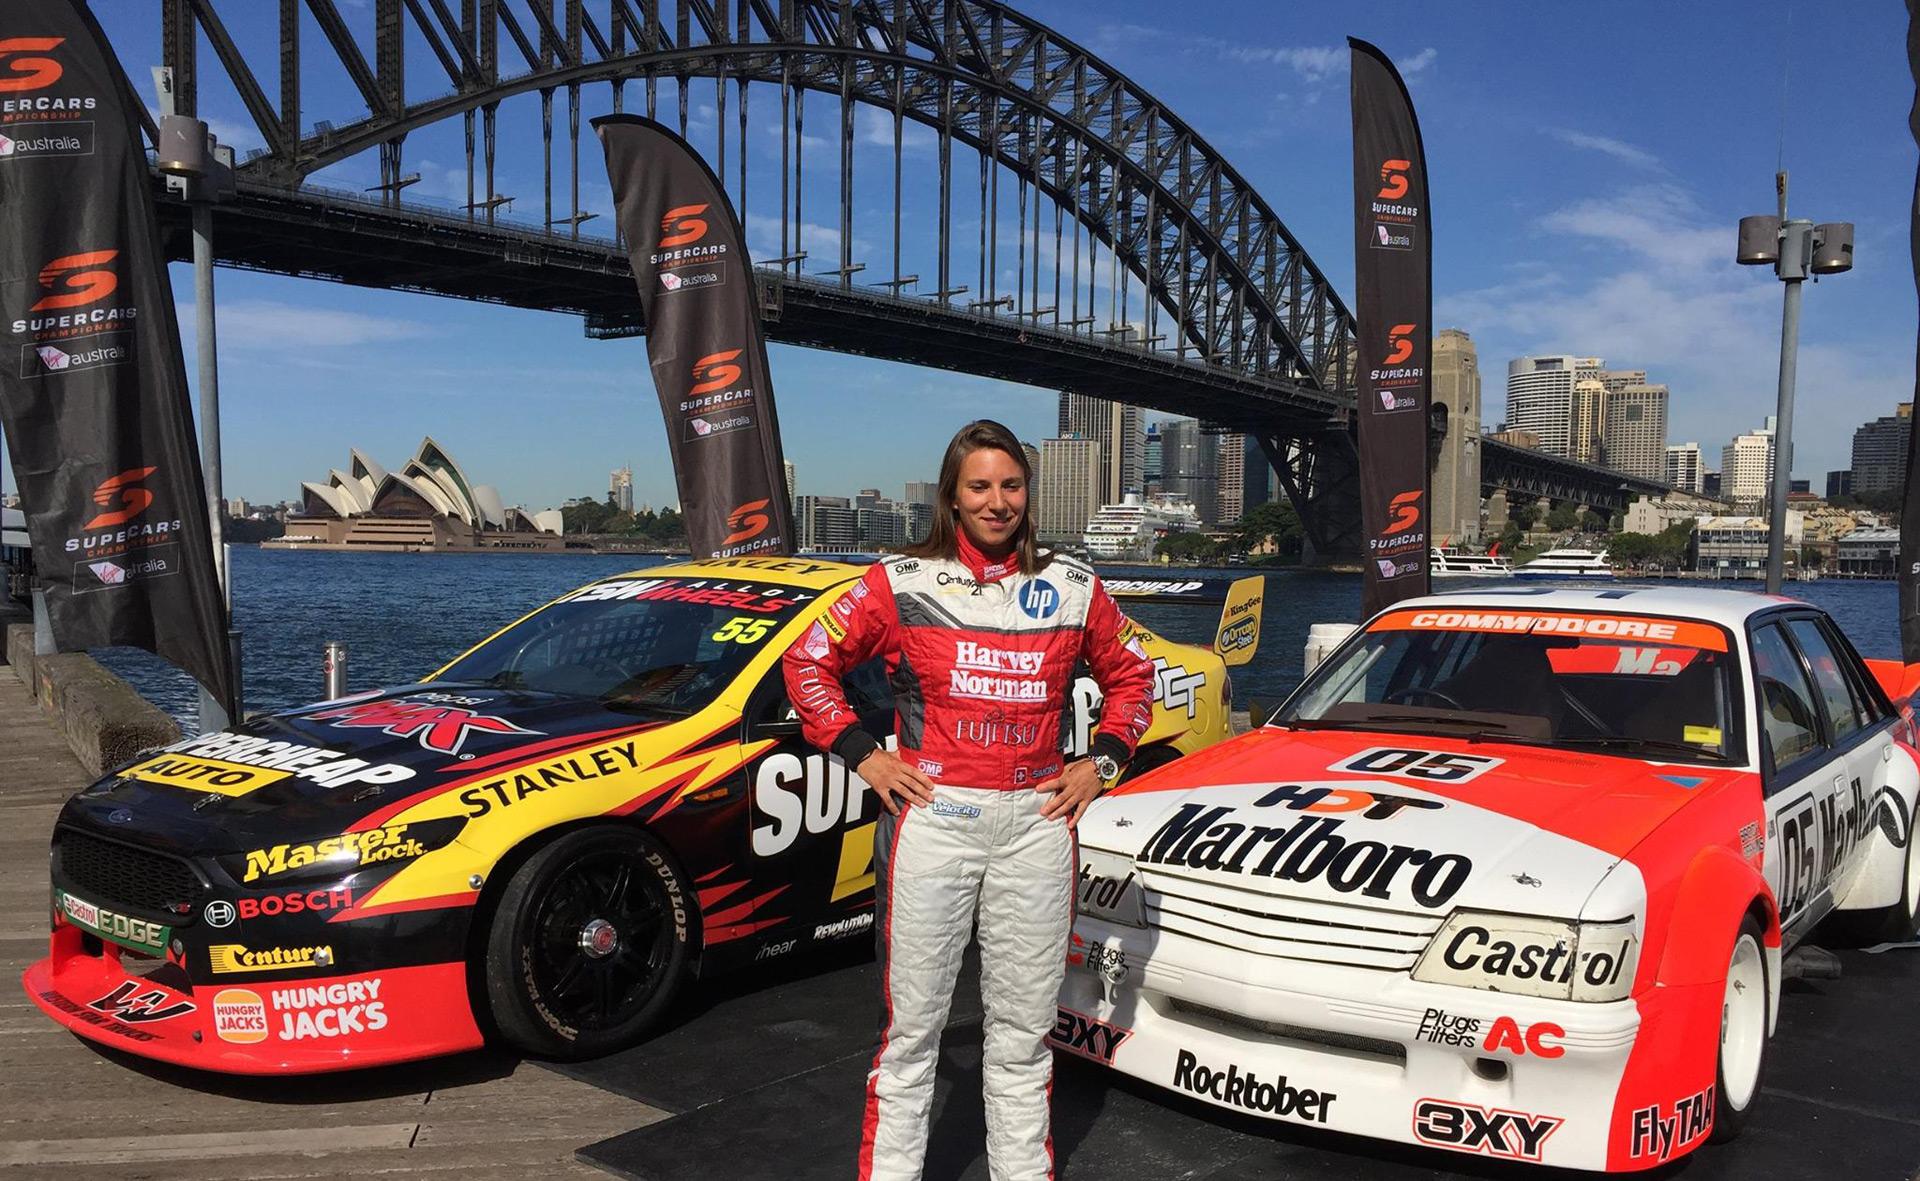 Former Indycar Driver Simona De Silvestro Joins Australia S Supercars